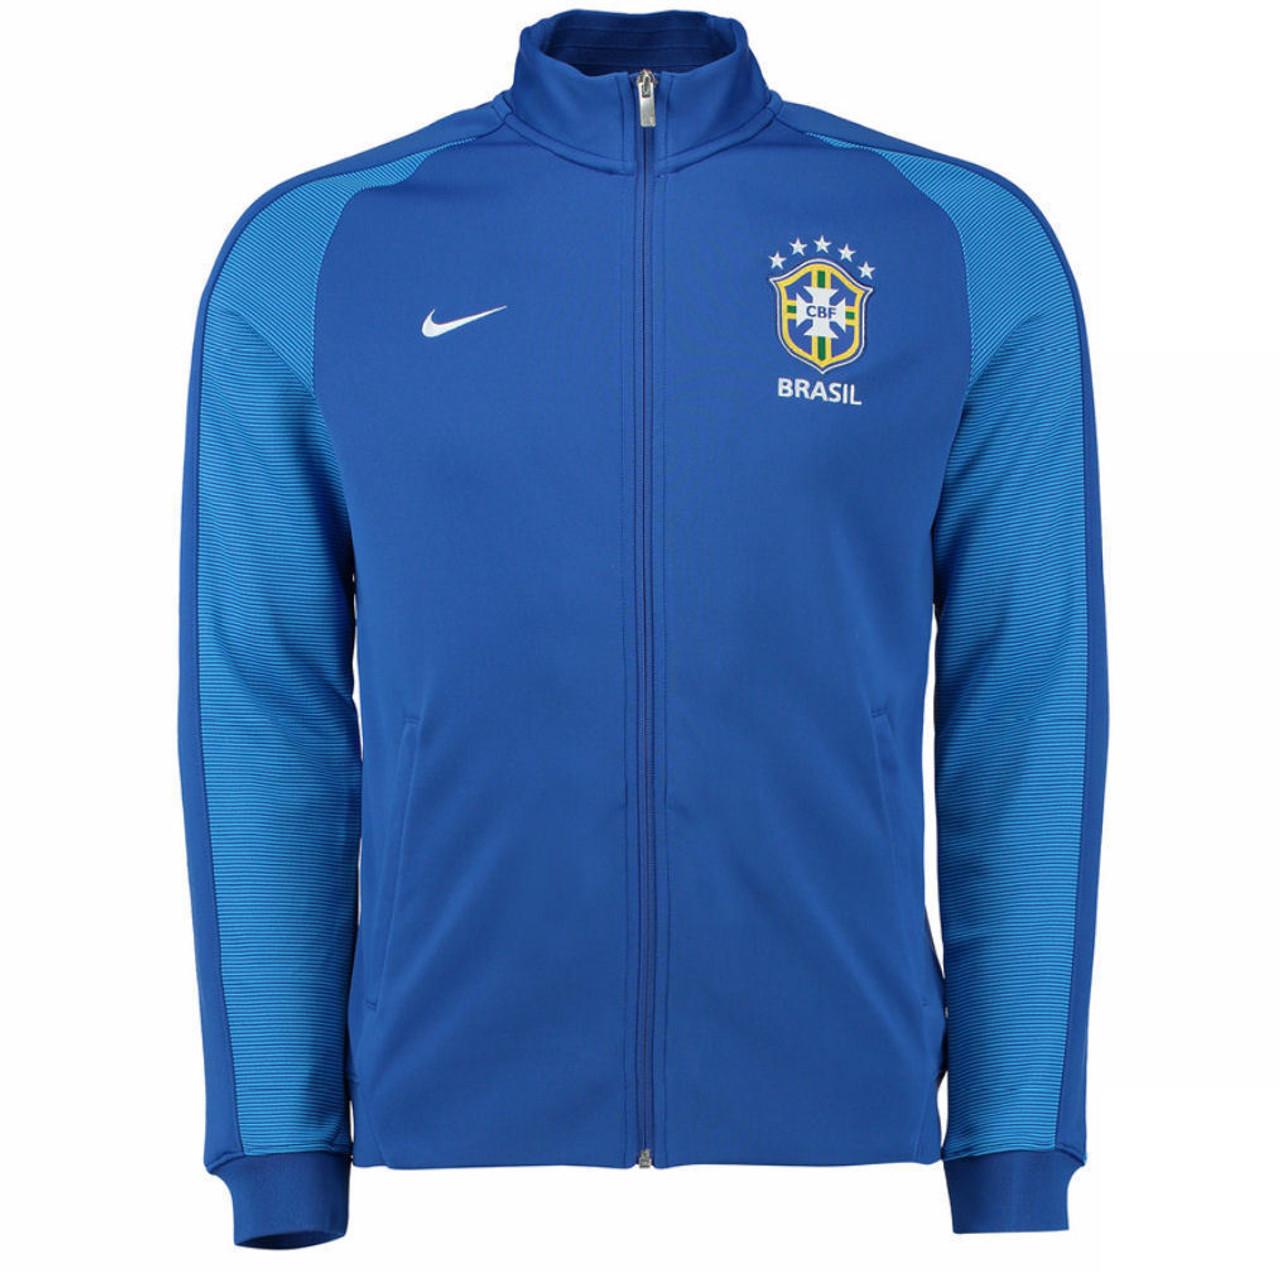 e5fb3a88f538 Nike Brazil 2016 17 Authentic N98 Track Jacket - Blue White (52818) - ohp  soccer